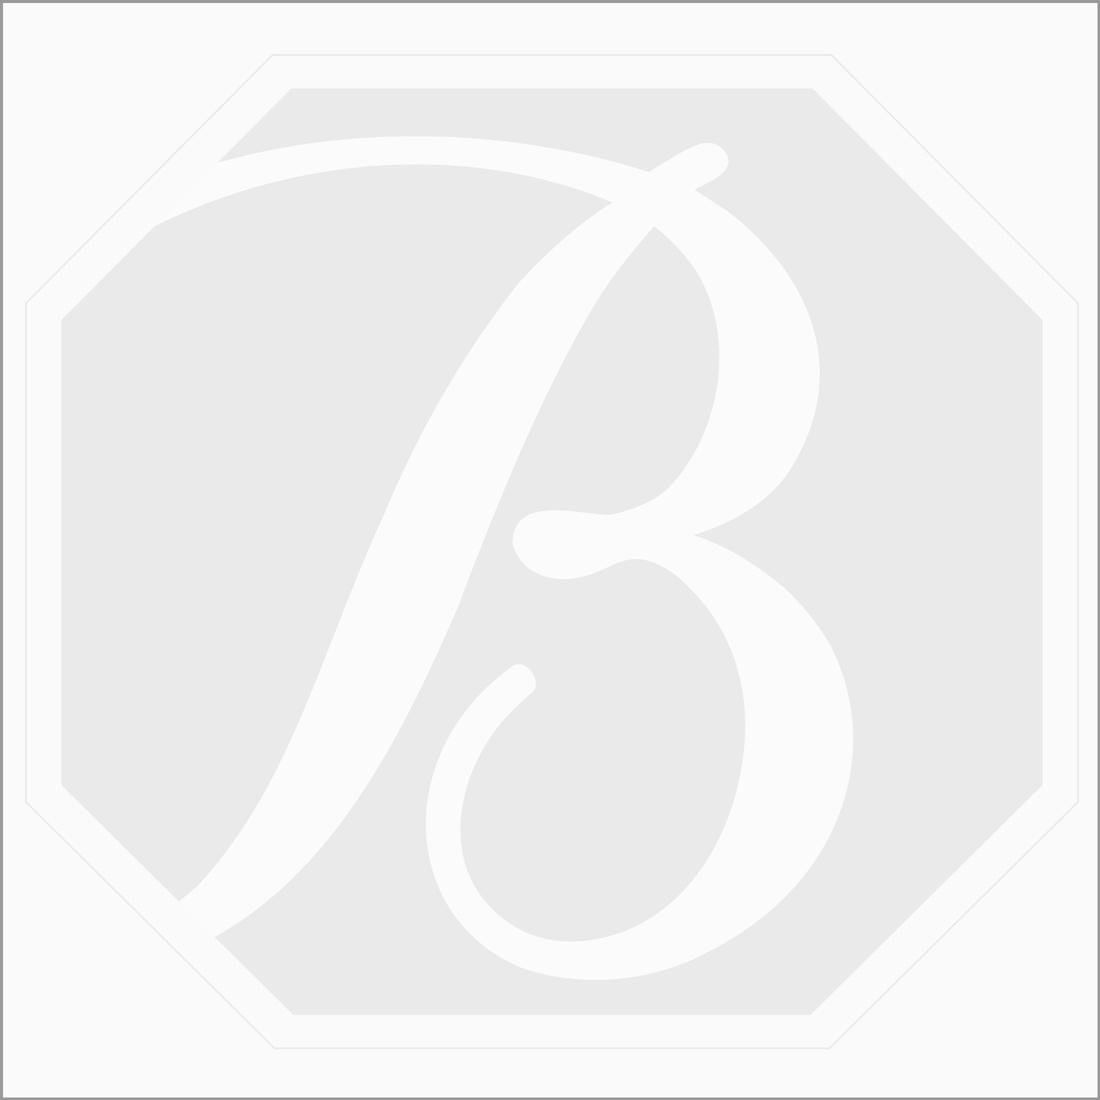 2 Brown Diamond Cushion Shape Rose Cut Diamonds - 3.92 cts. (DRC1266)